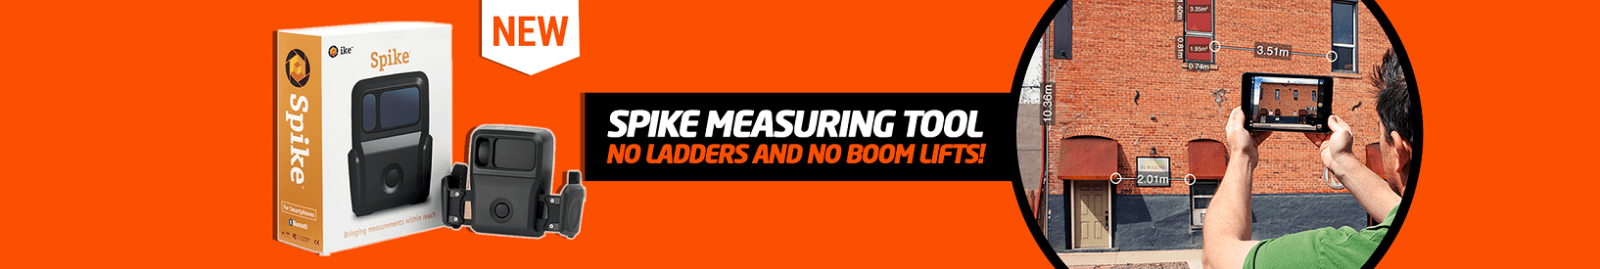 Spike Measuring